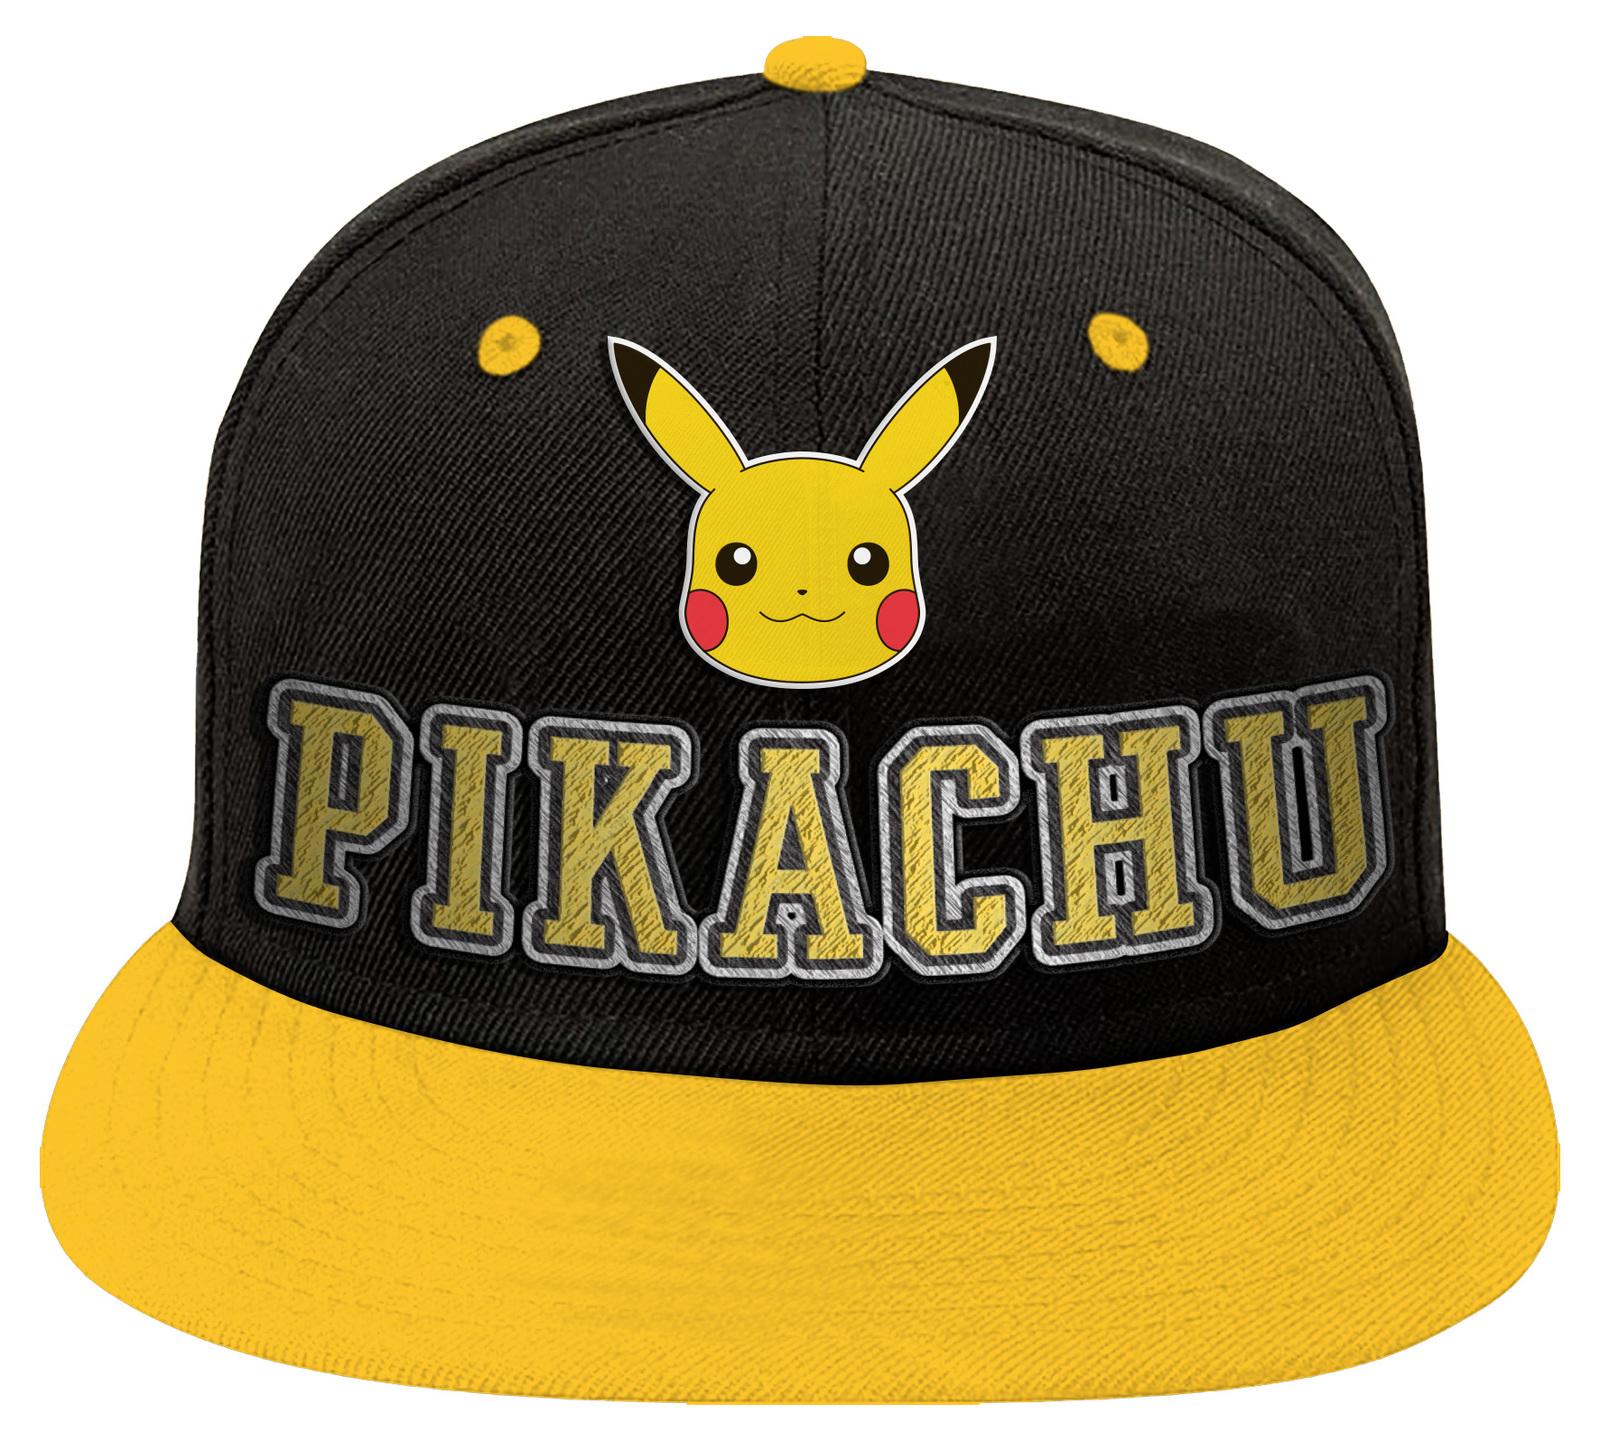 Pokemon Pikachu Character Cap image